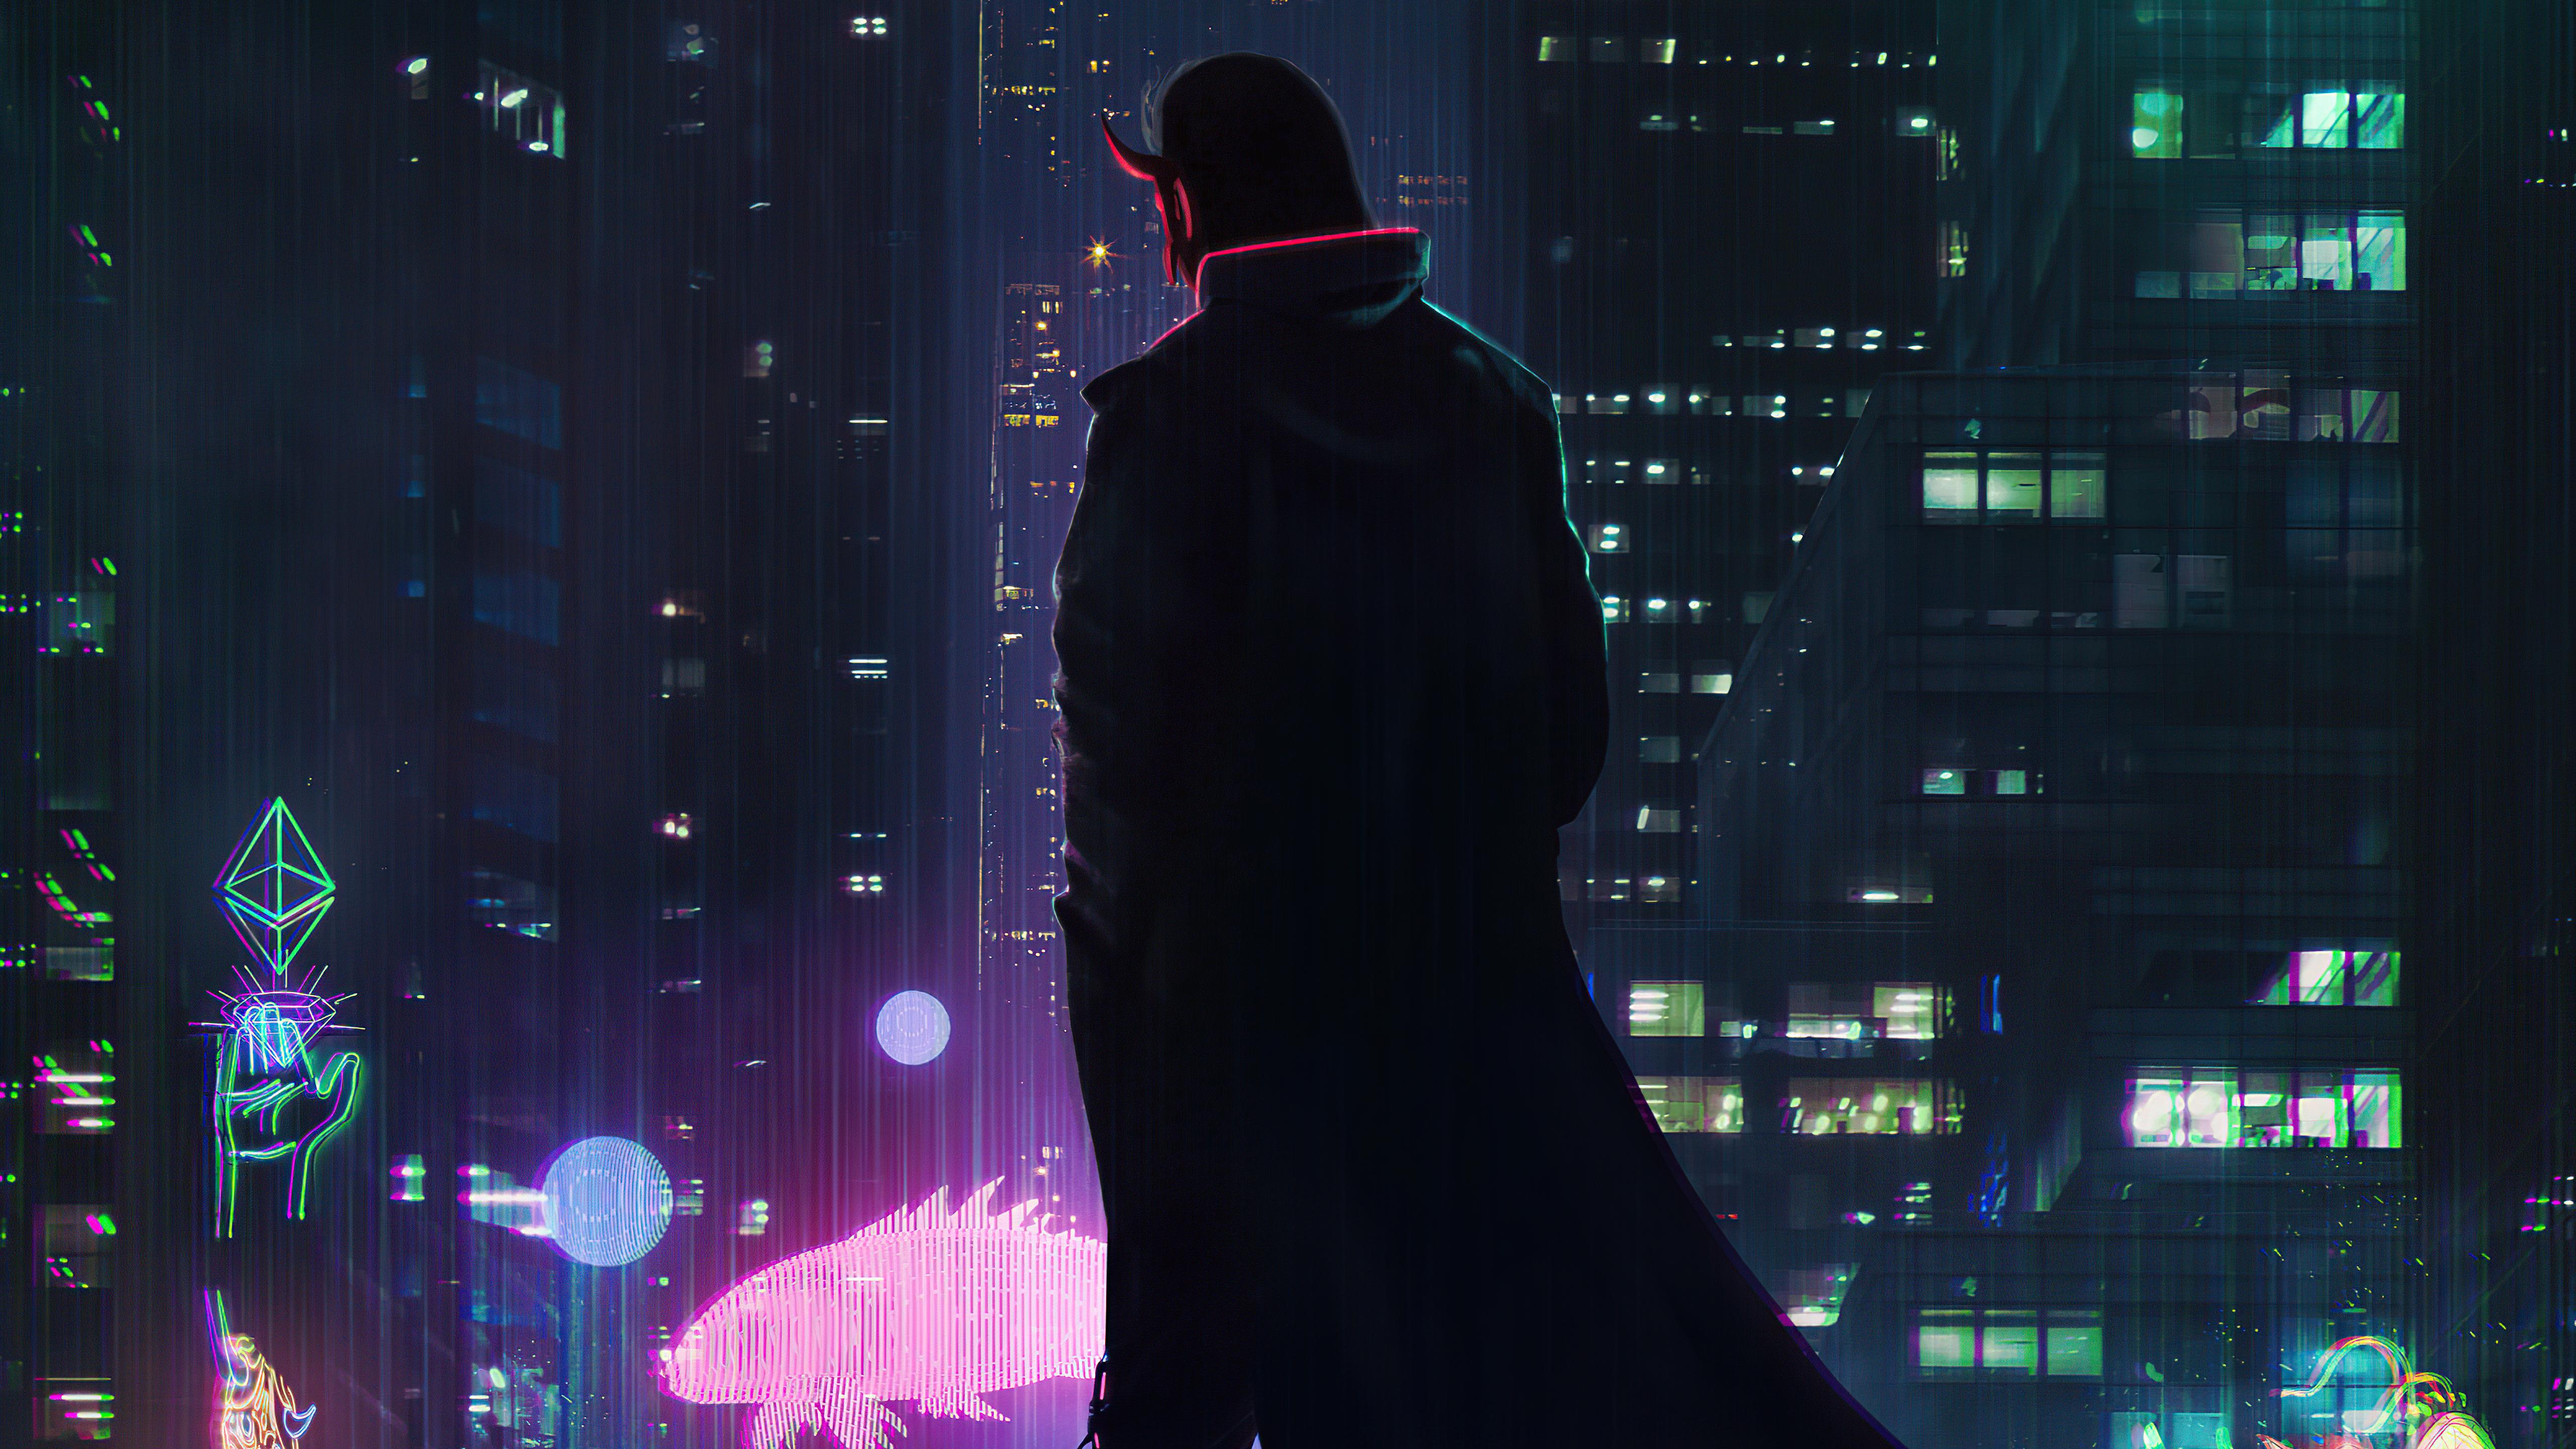 in cyber city cyberpunk 4k 1634170554 - In Cyber City Cyberpunk 4k - In Cyber City Cyberpunk wallpapers, In Cyber City Cyberpunk 4k wallpapers